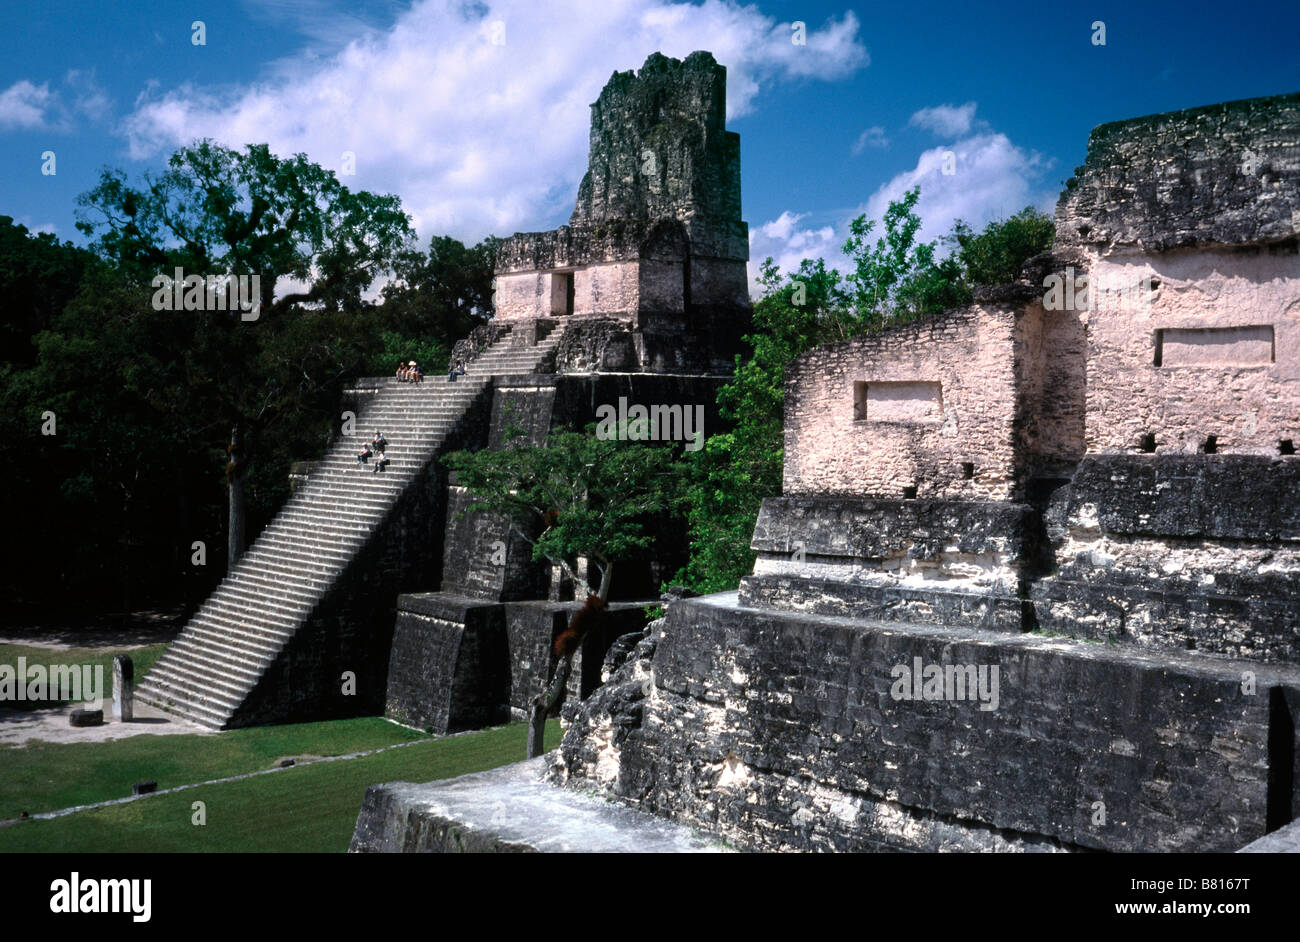 Feb 20, 2002 - Temple II at Plaza Mayor at Mayan ruins of Tikal in the Guatemalan province of El Peten. - Stock Image